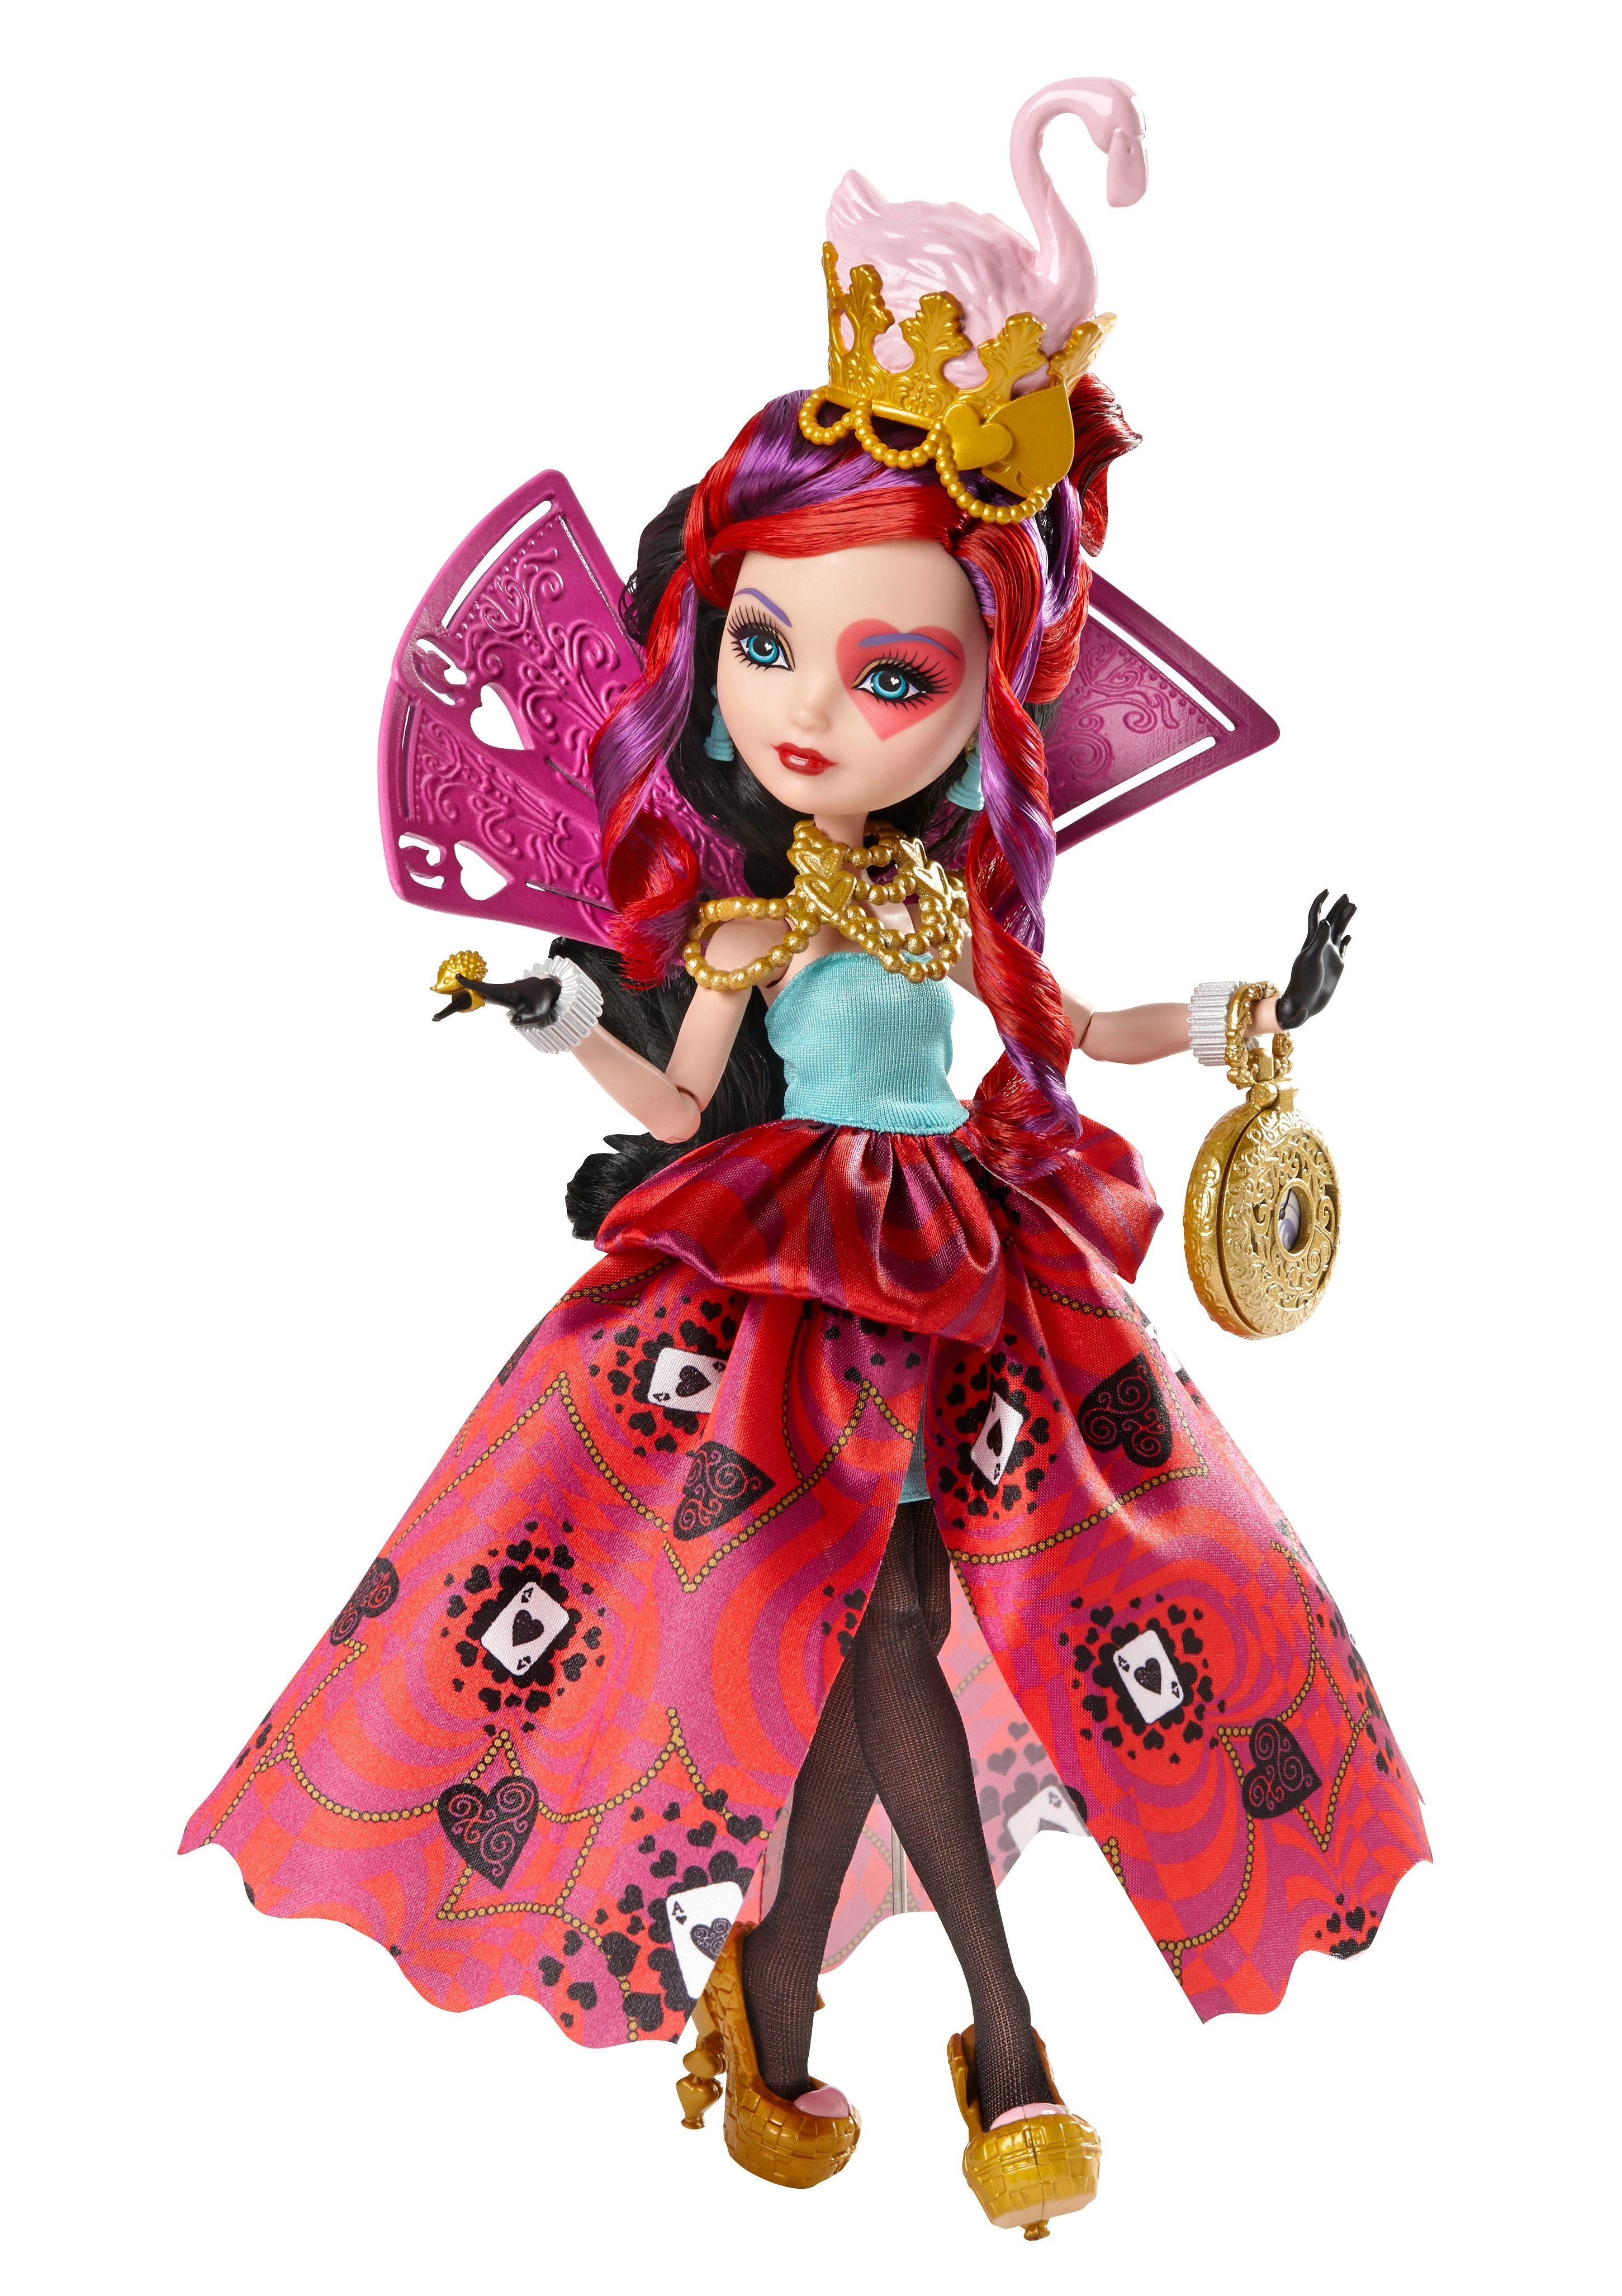 Mattel Puppe Ever After High, »Wunderland Lizzie Hearts«